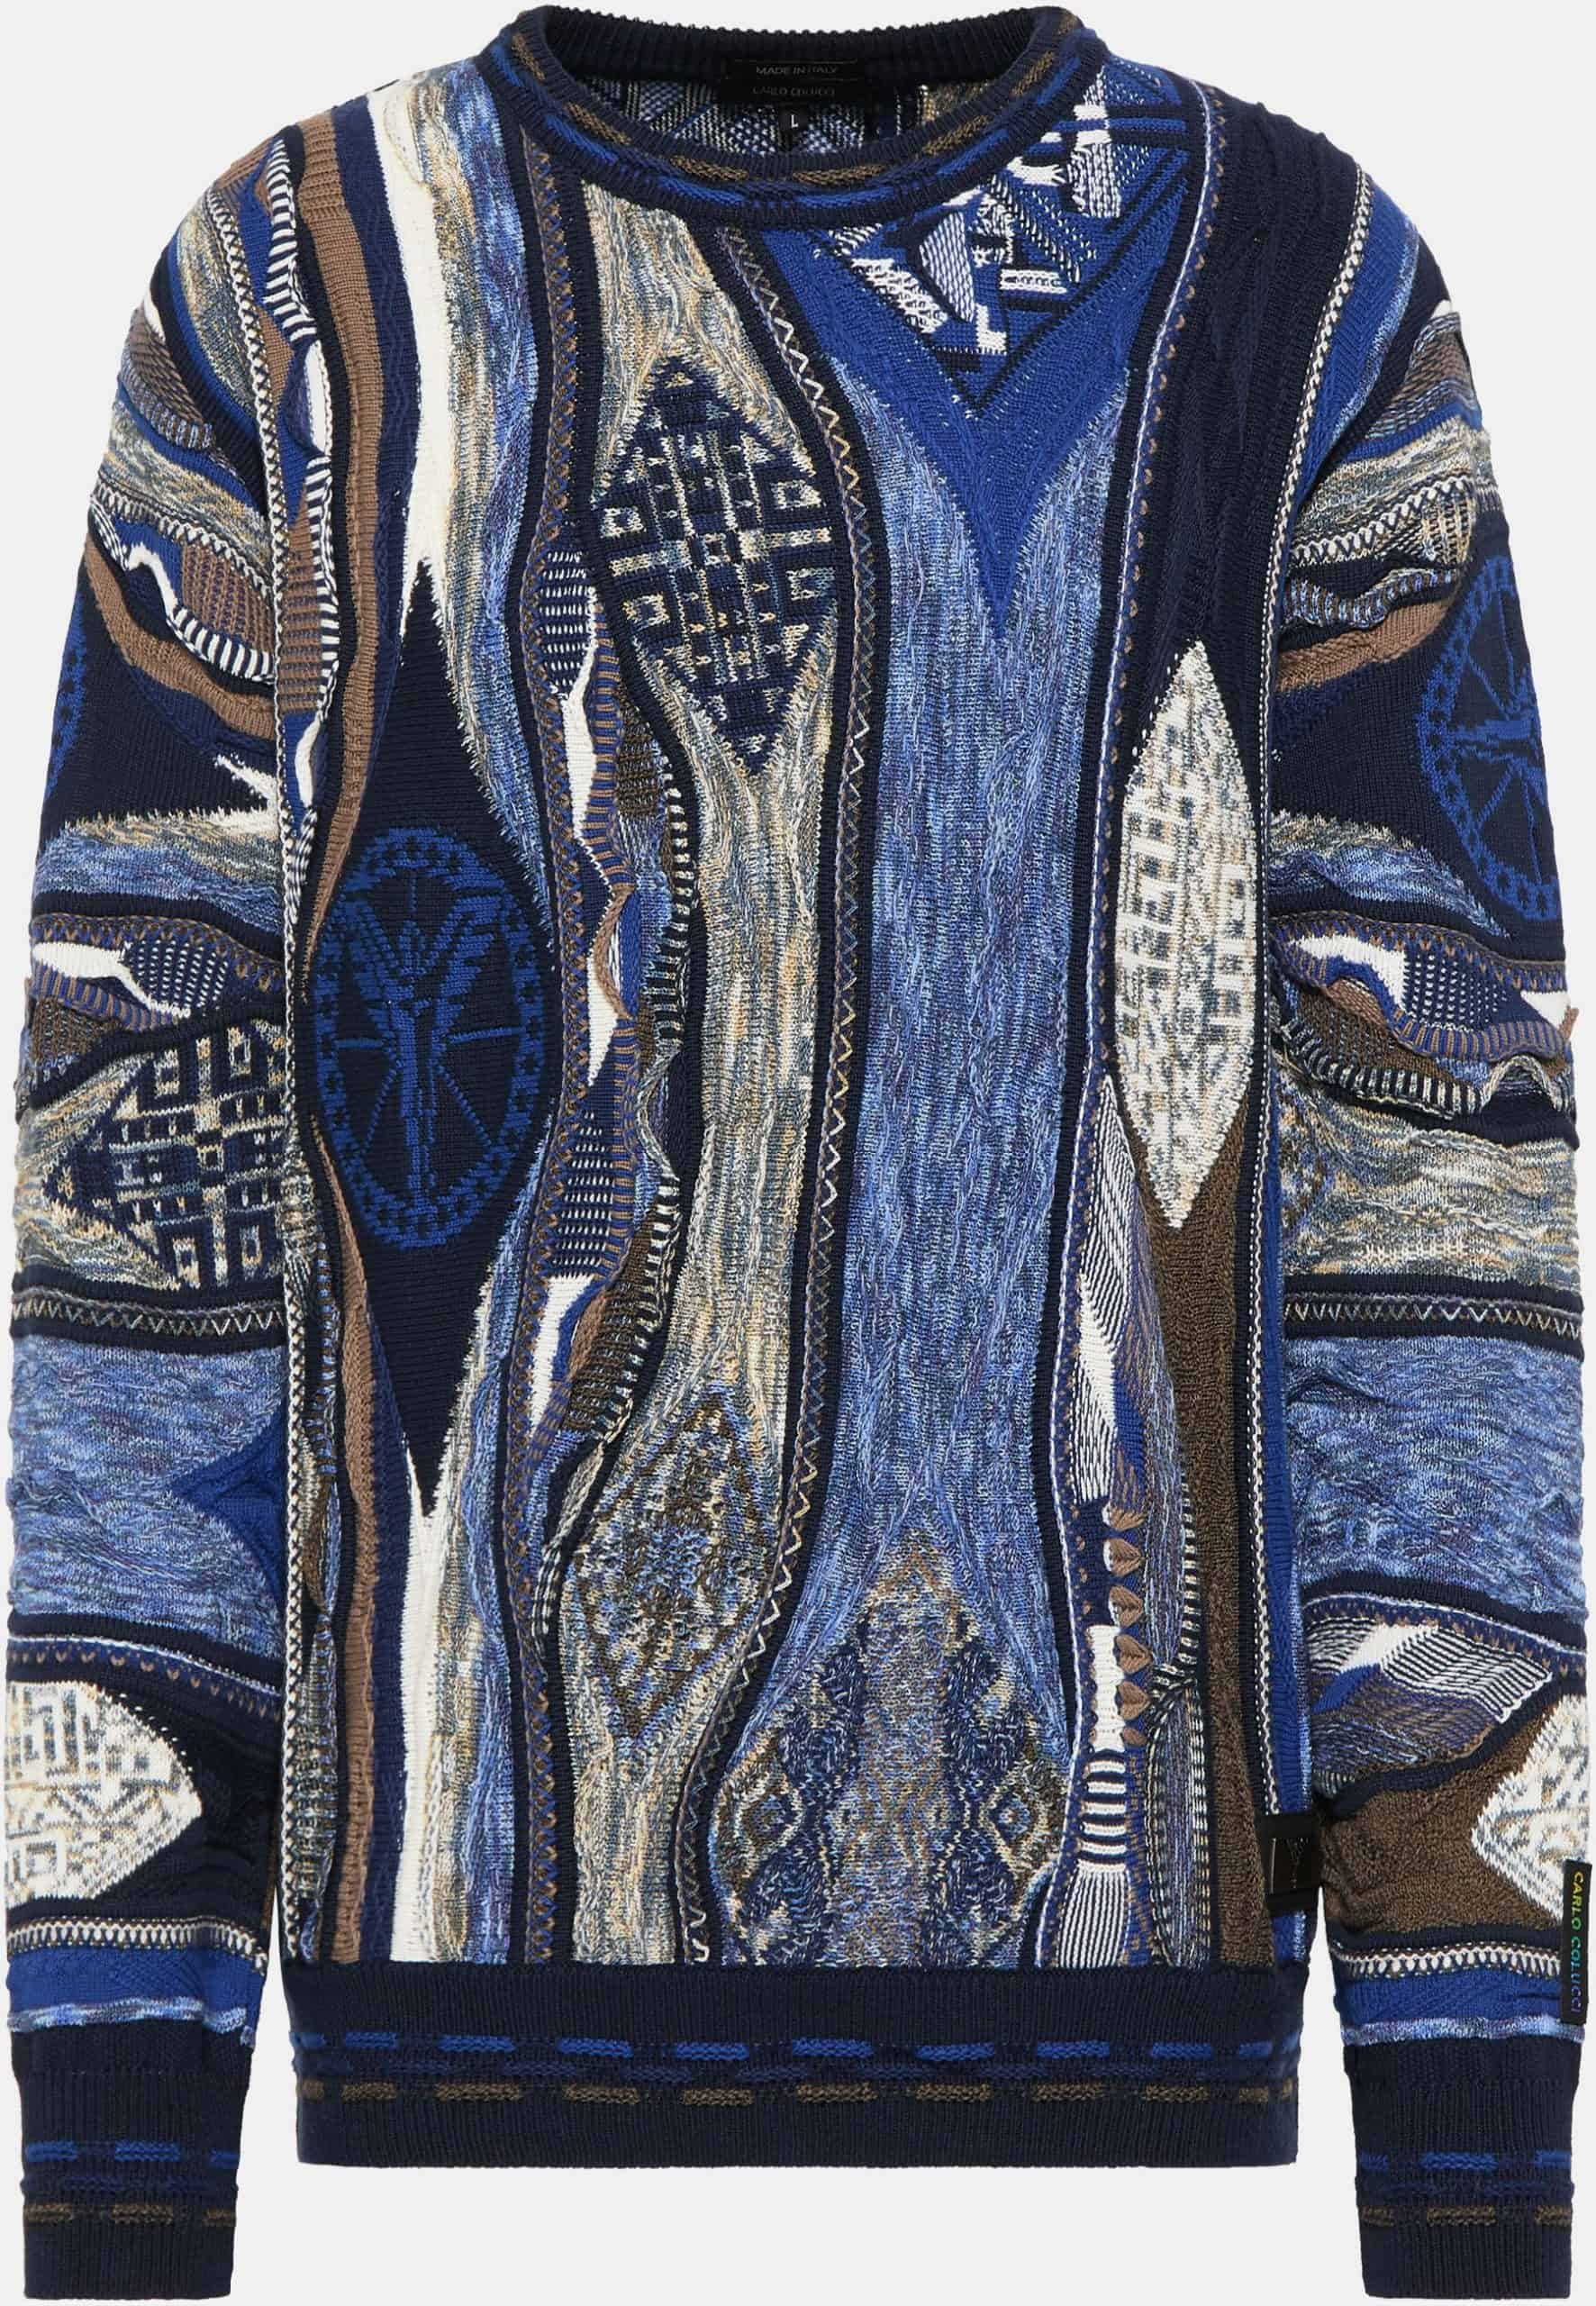 Carlo Colucci Sweater C9911 Navy